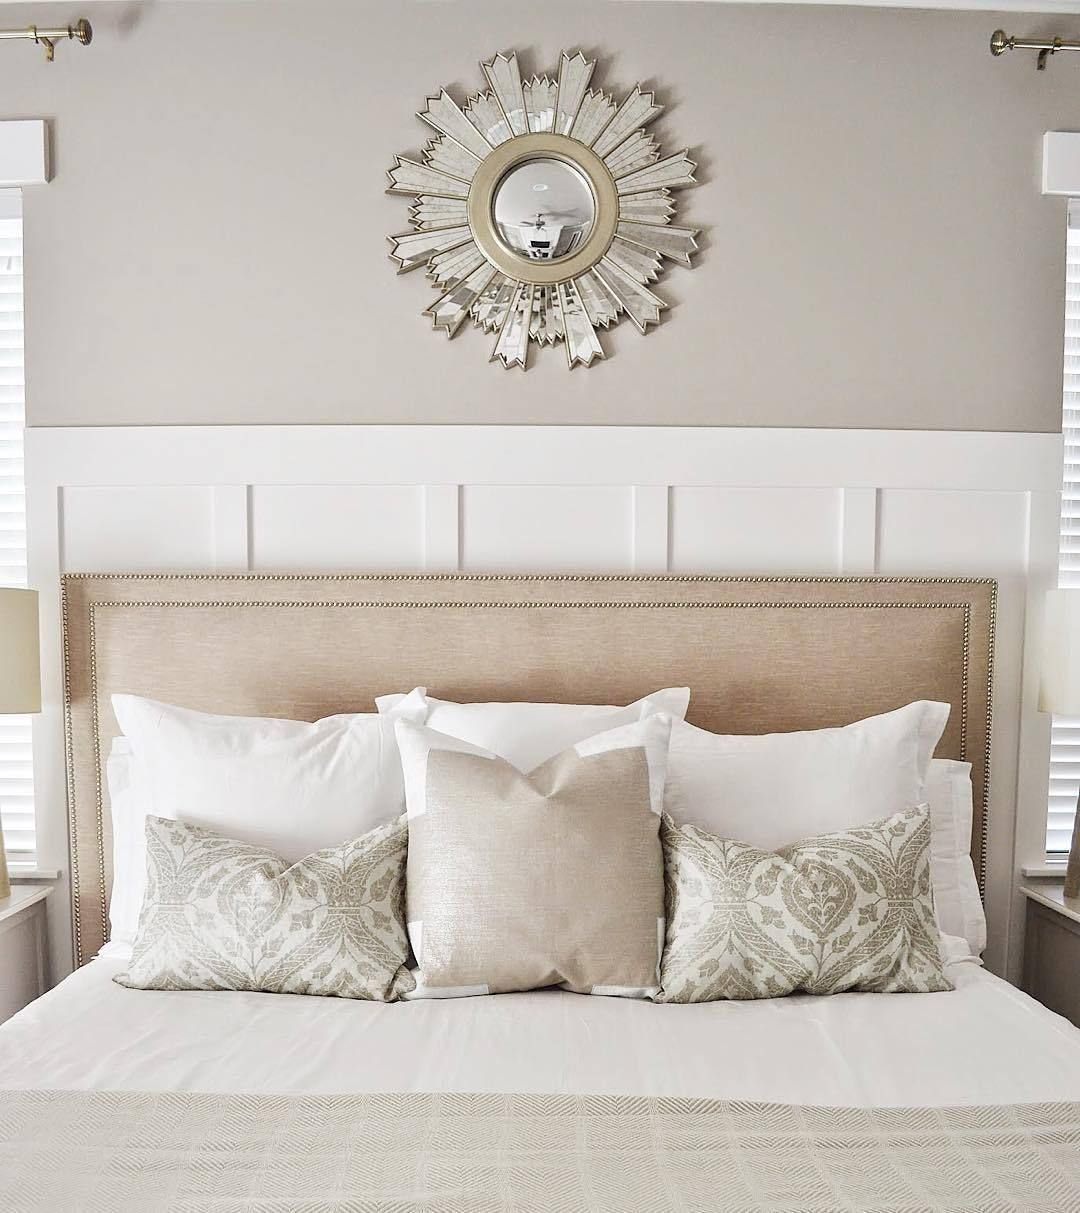 Sunburst Mirror Over Bed In 2019 Home Mirror Over Bed Sunburst